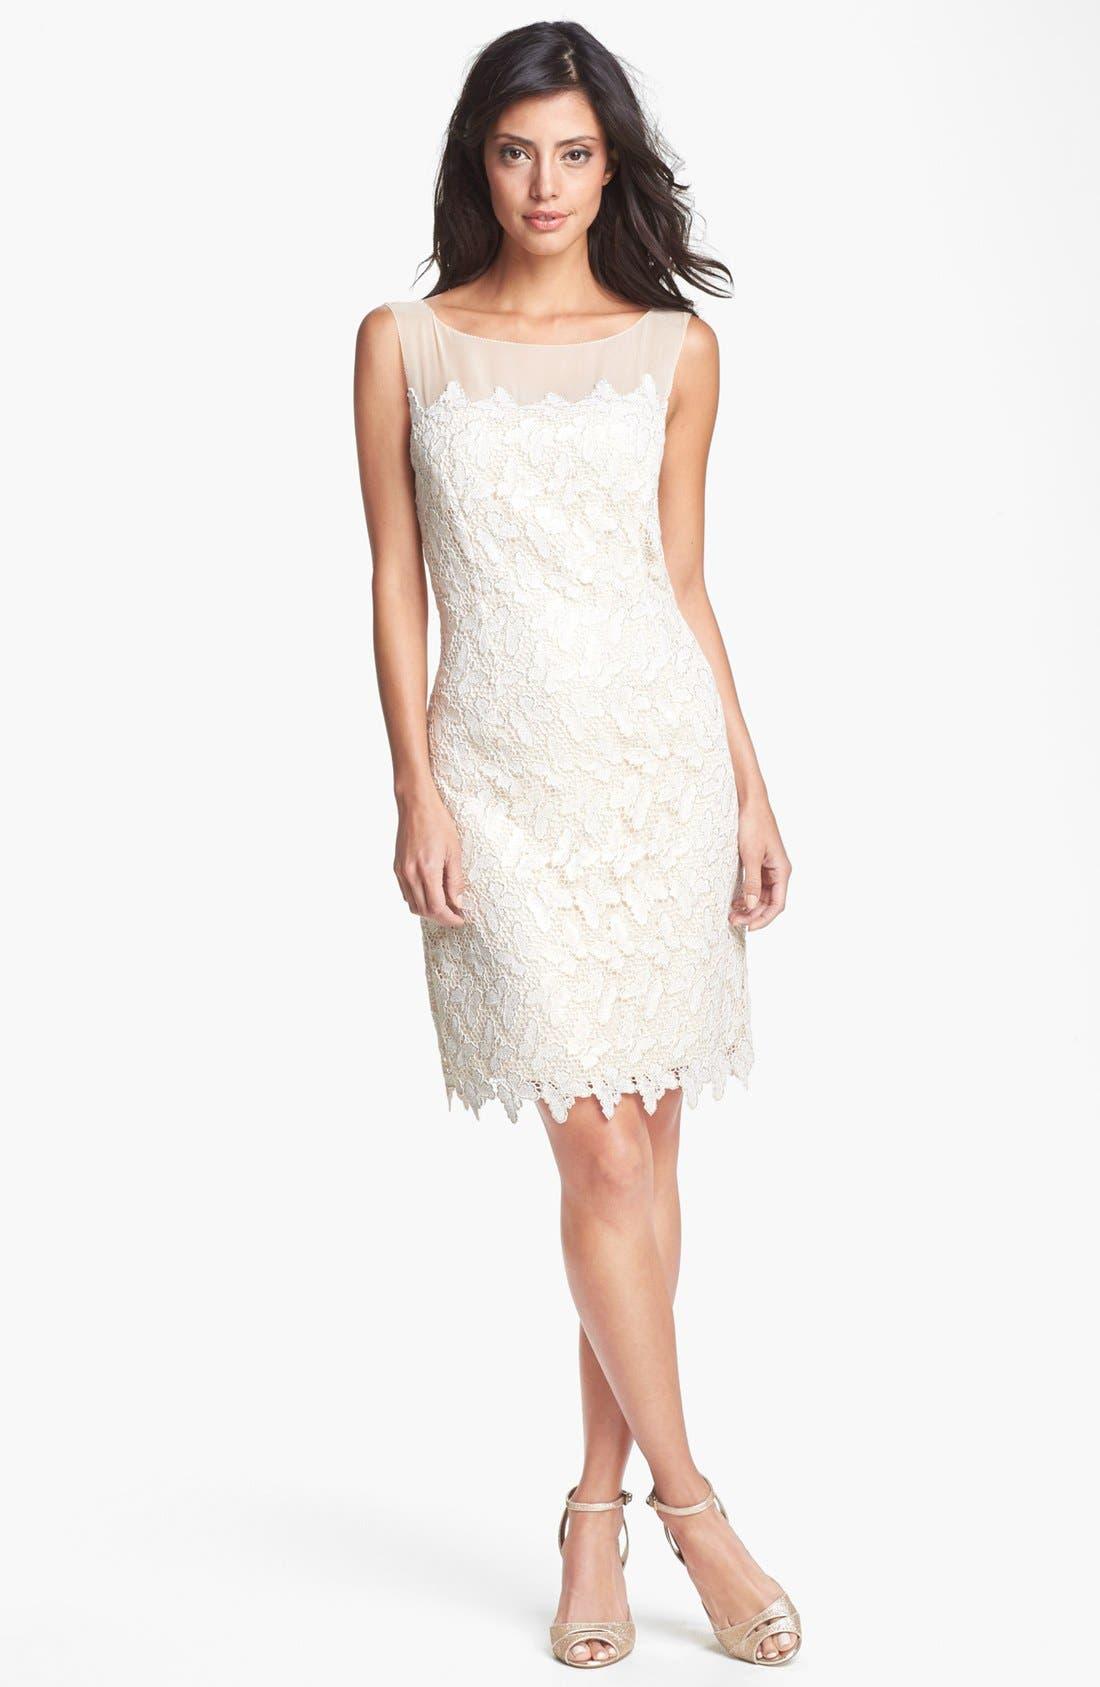 Main Image - Lilly Pulitzer® 'Fulton' Foiled Lace Cotton Sheath Dress